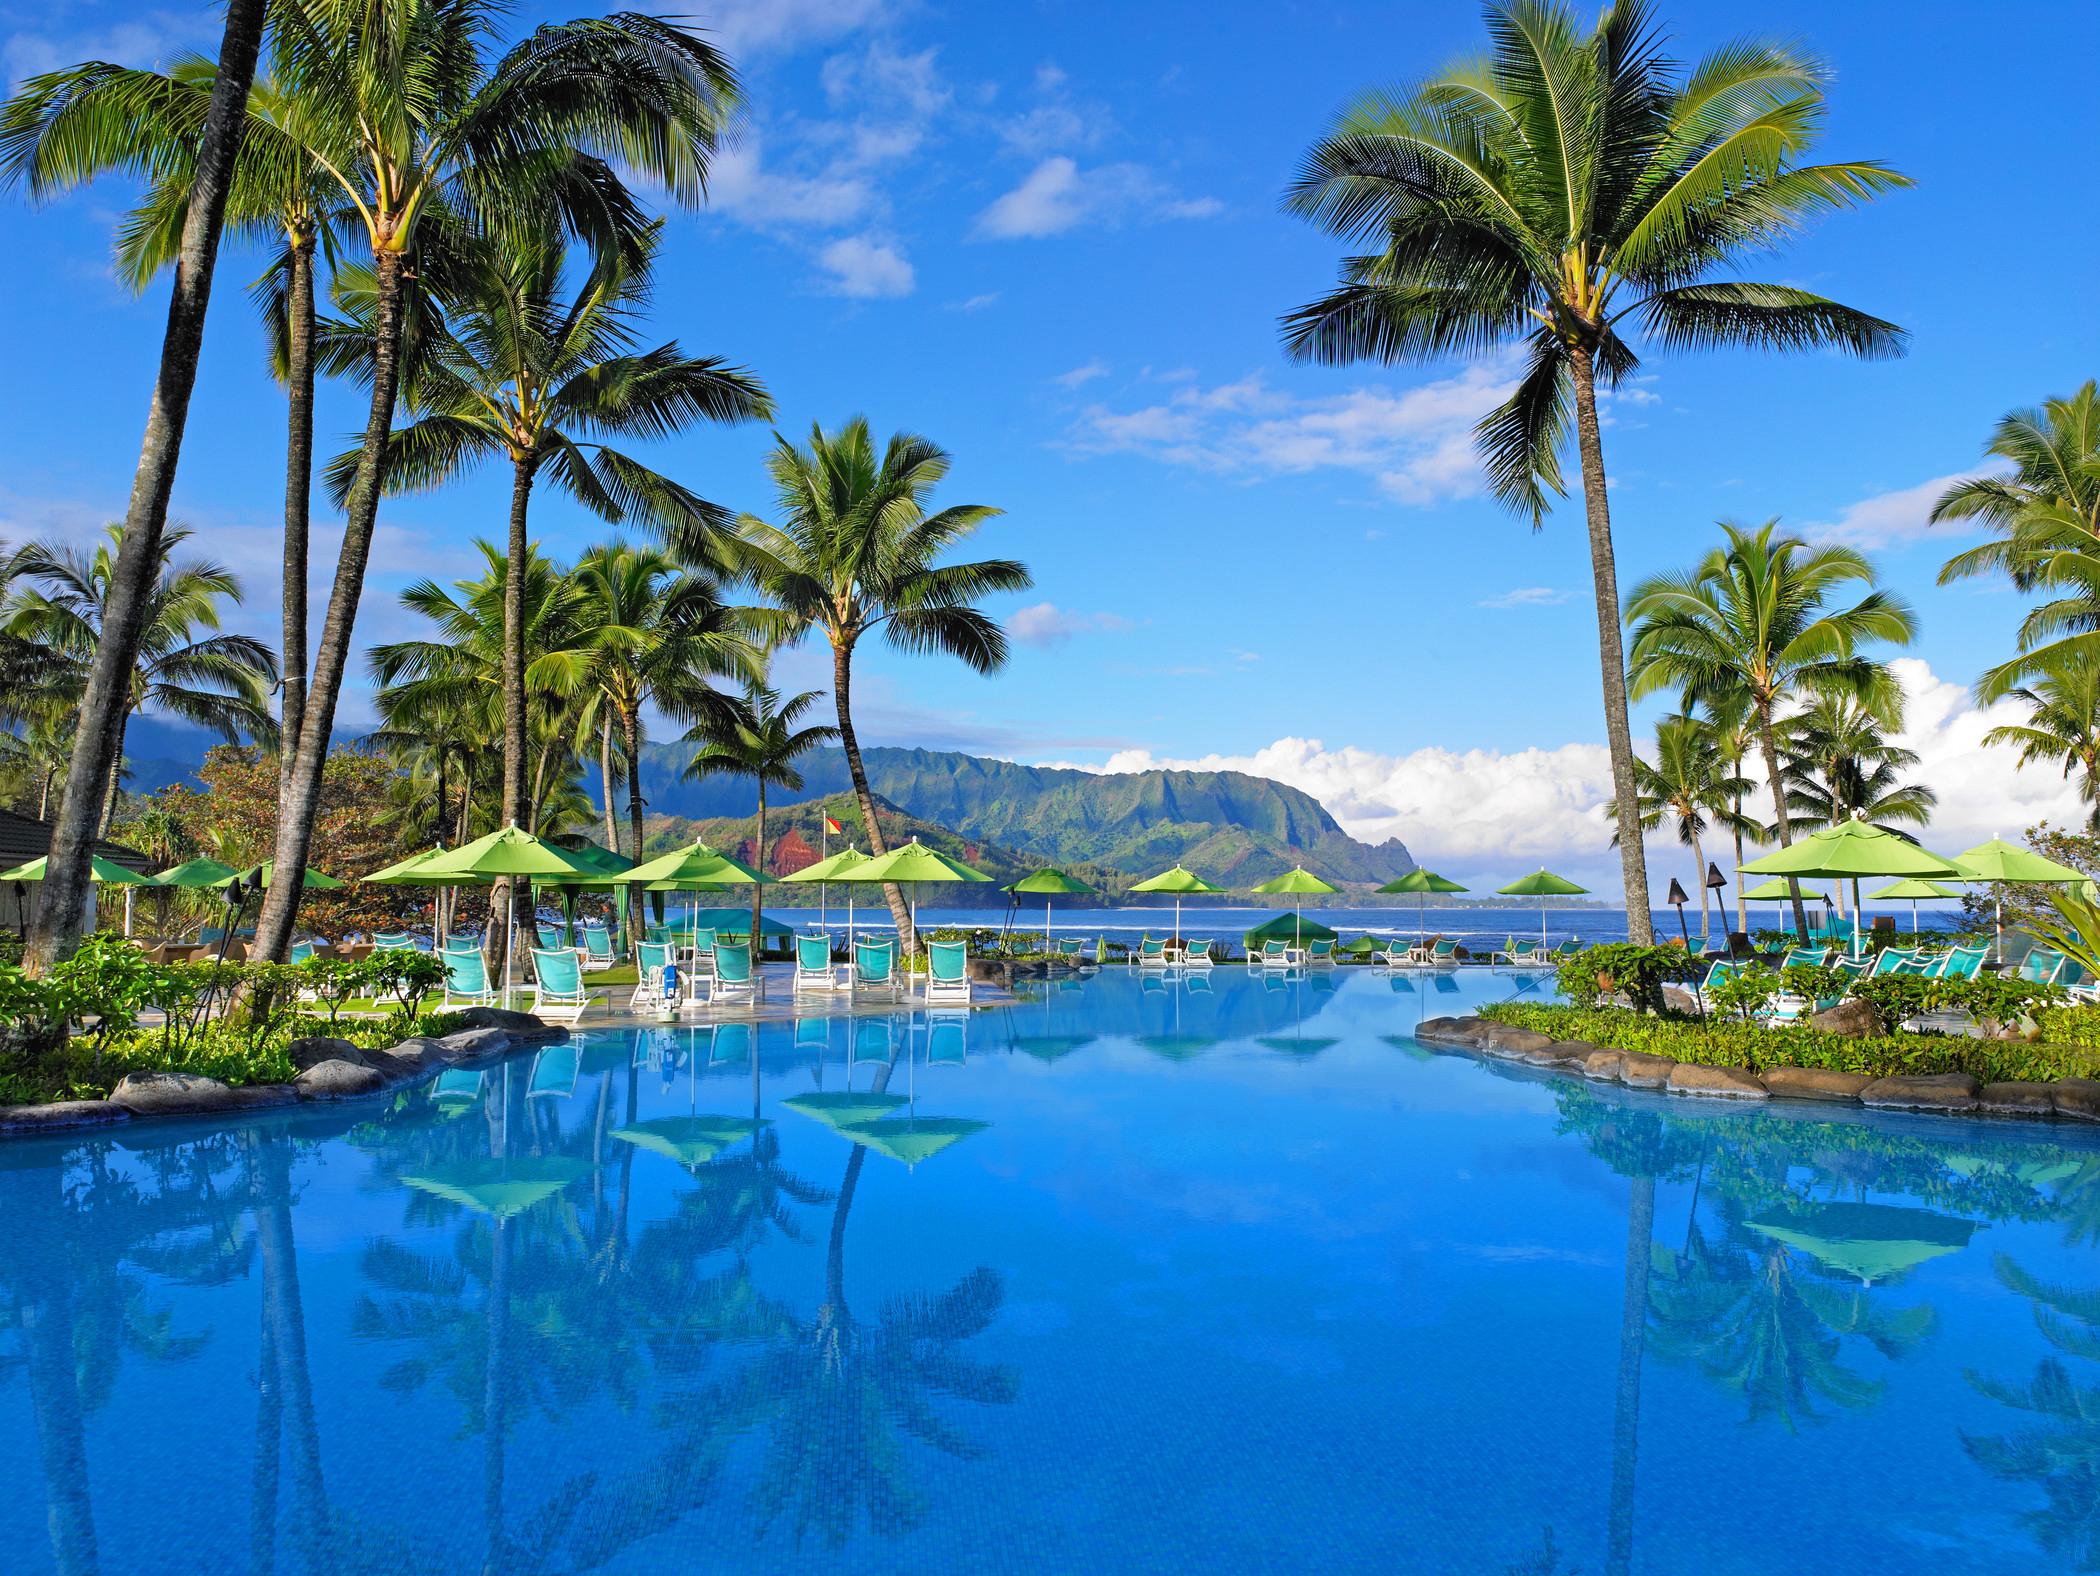 honeymooners guide hawaii st regis princeville resort 0218